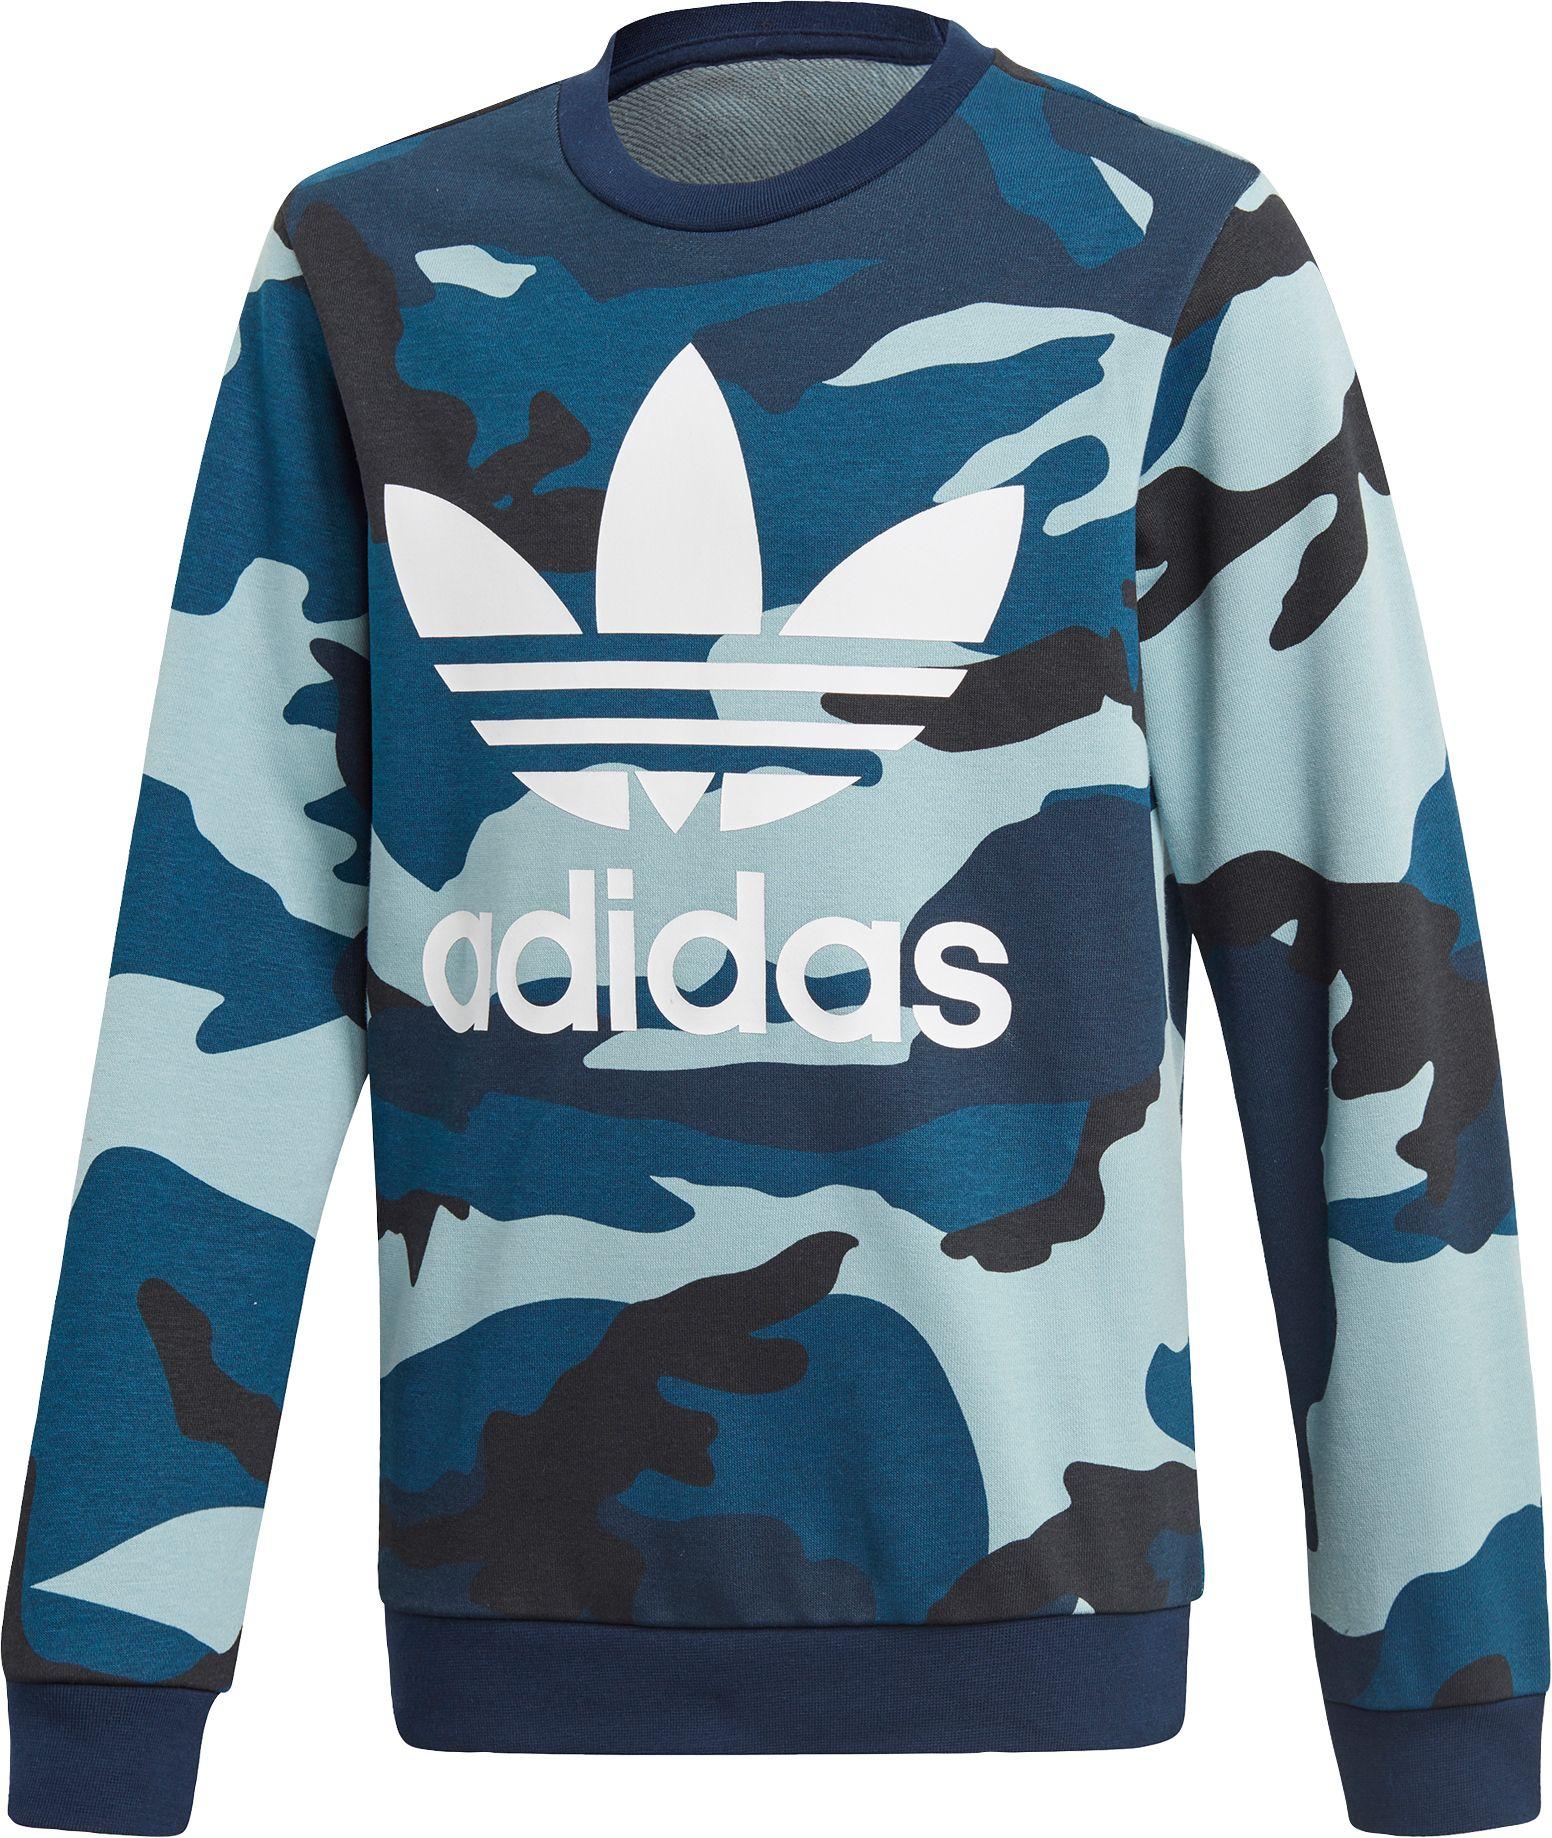 adidas Originals Boys' Camo Crewneck Sweatshirt, Boy's, Size: XS, Multi/White thumbnail